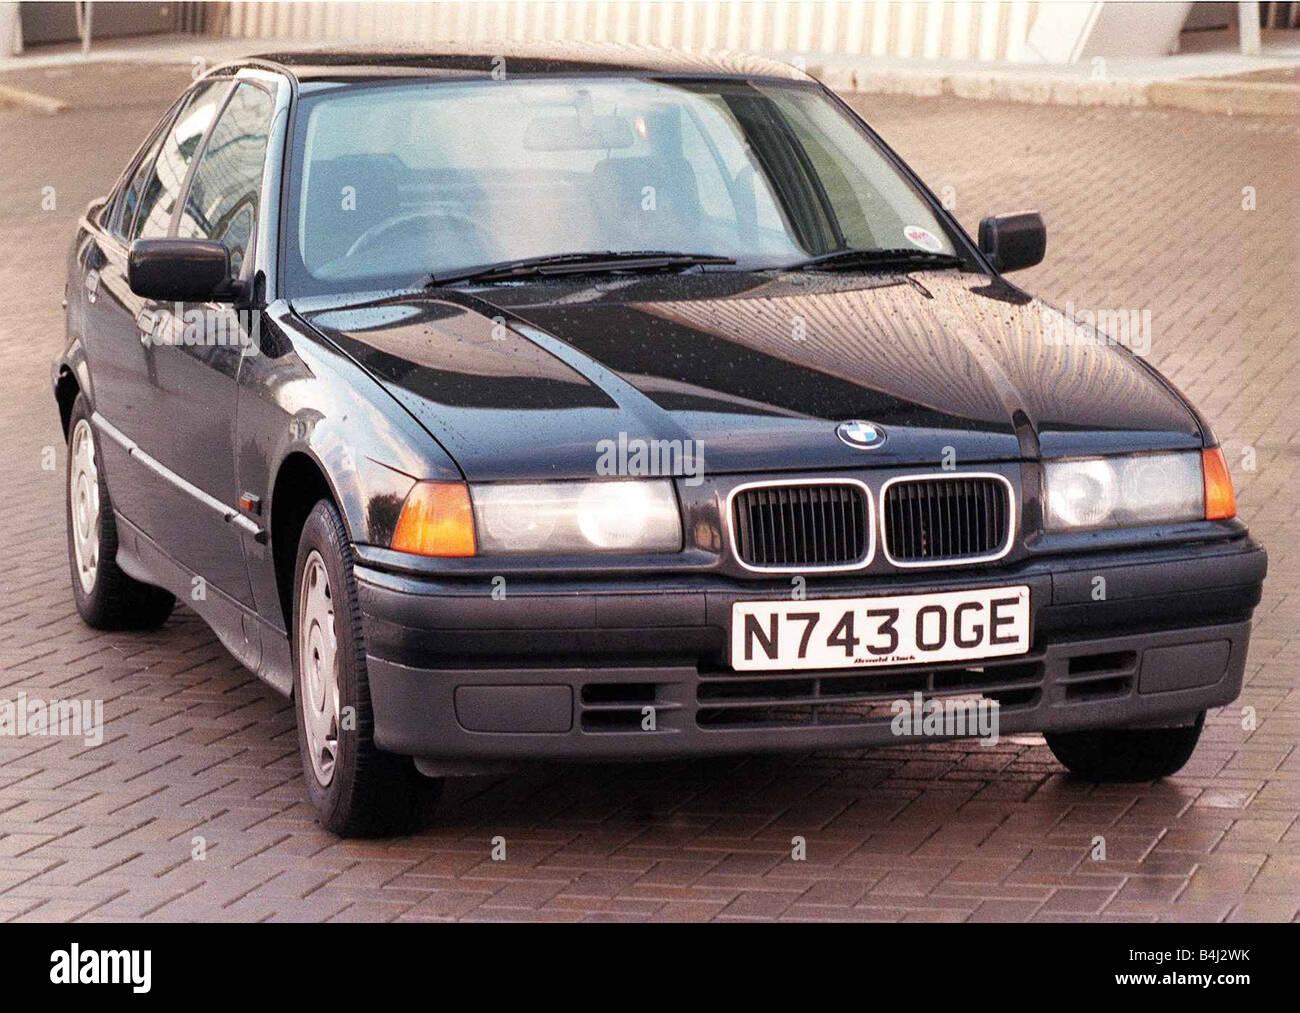 SECOND HAND BMW 3er Oktober 1998 Dreiviertel-Ansicht Stockbild